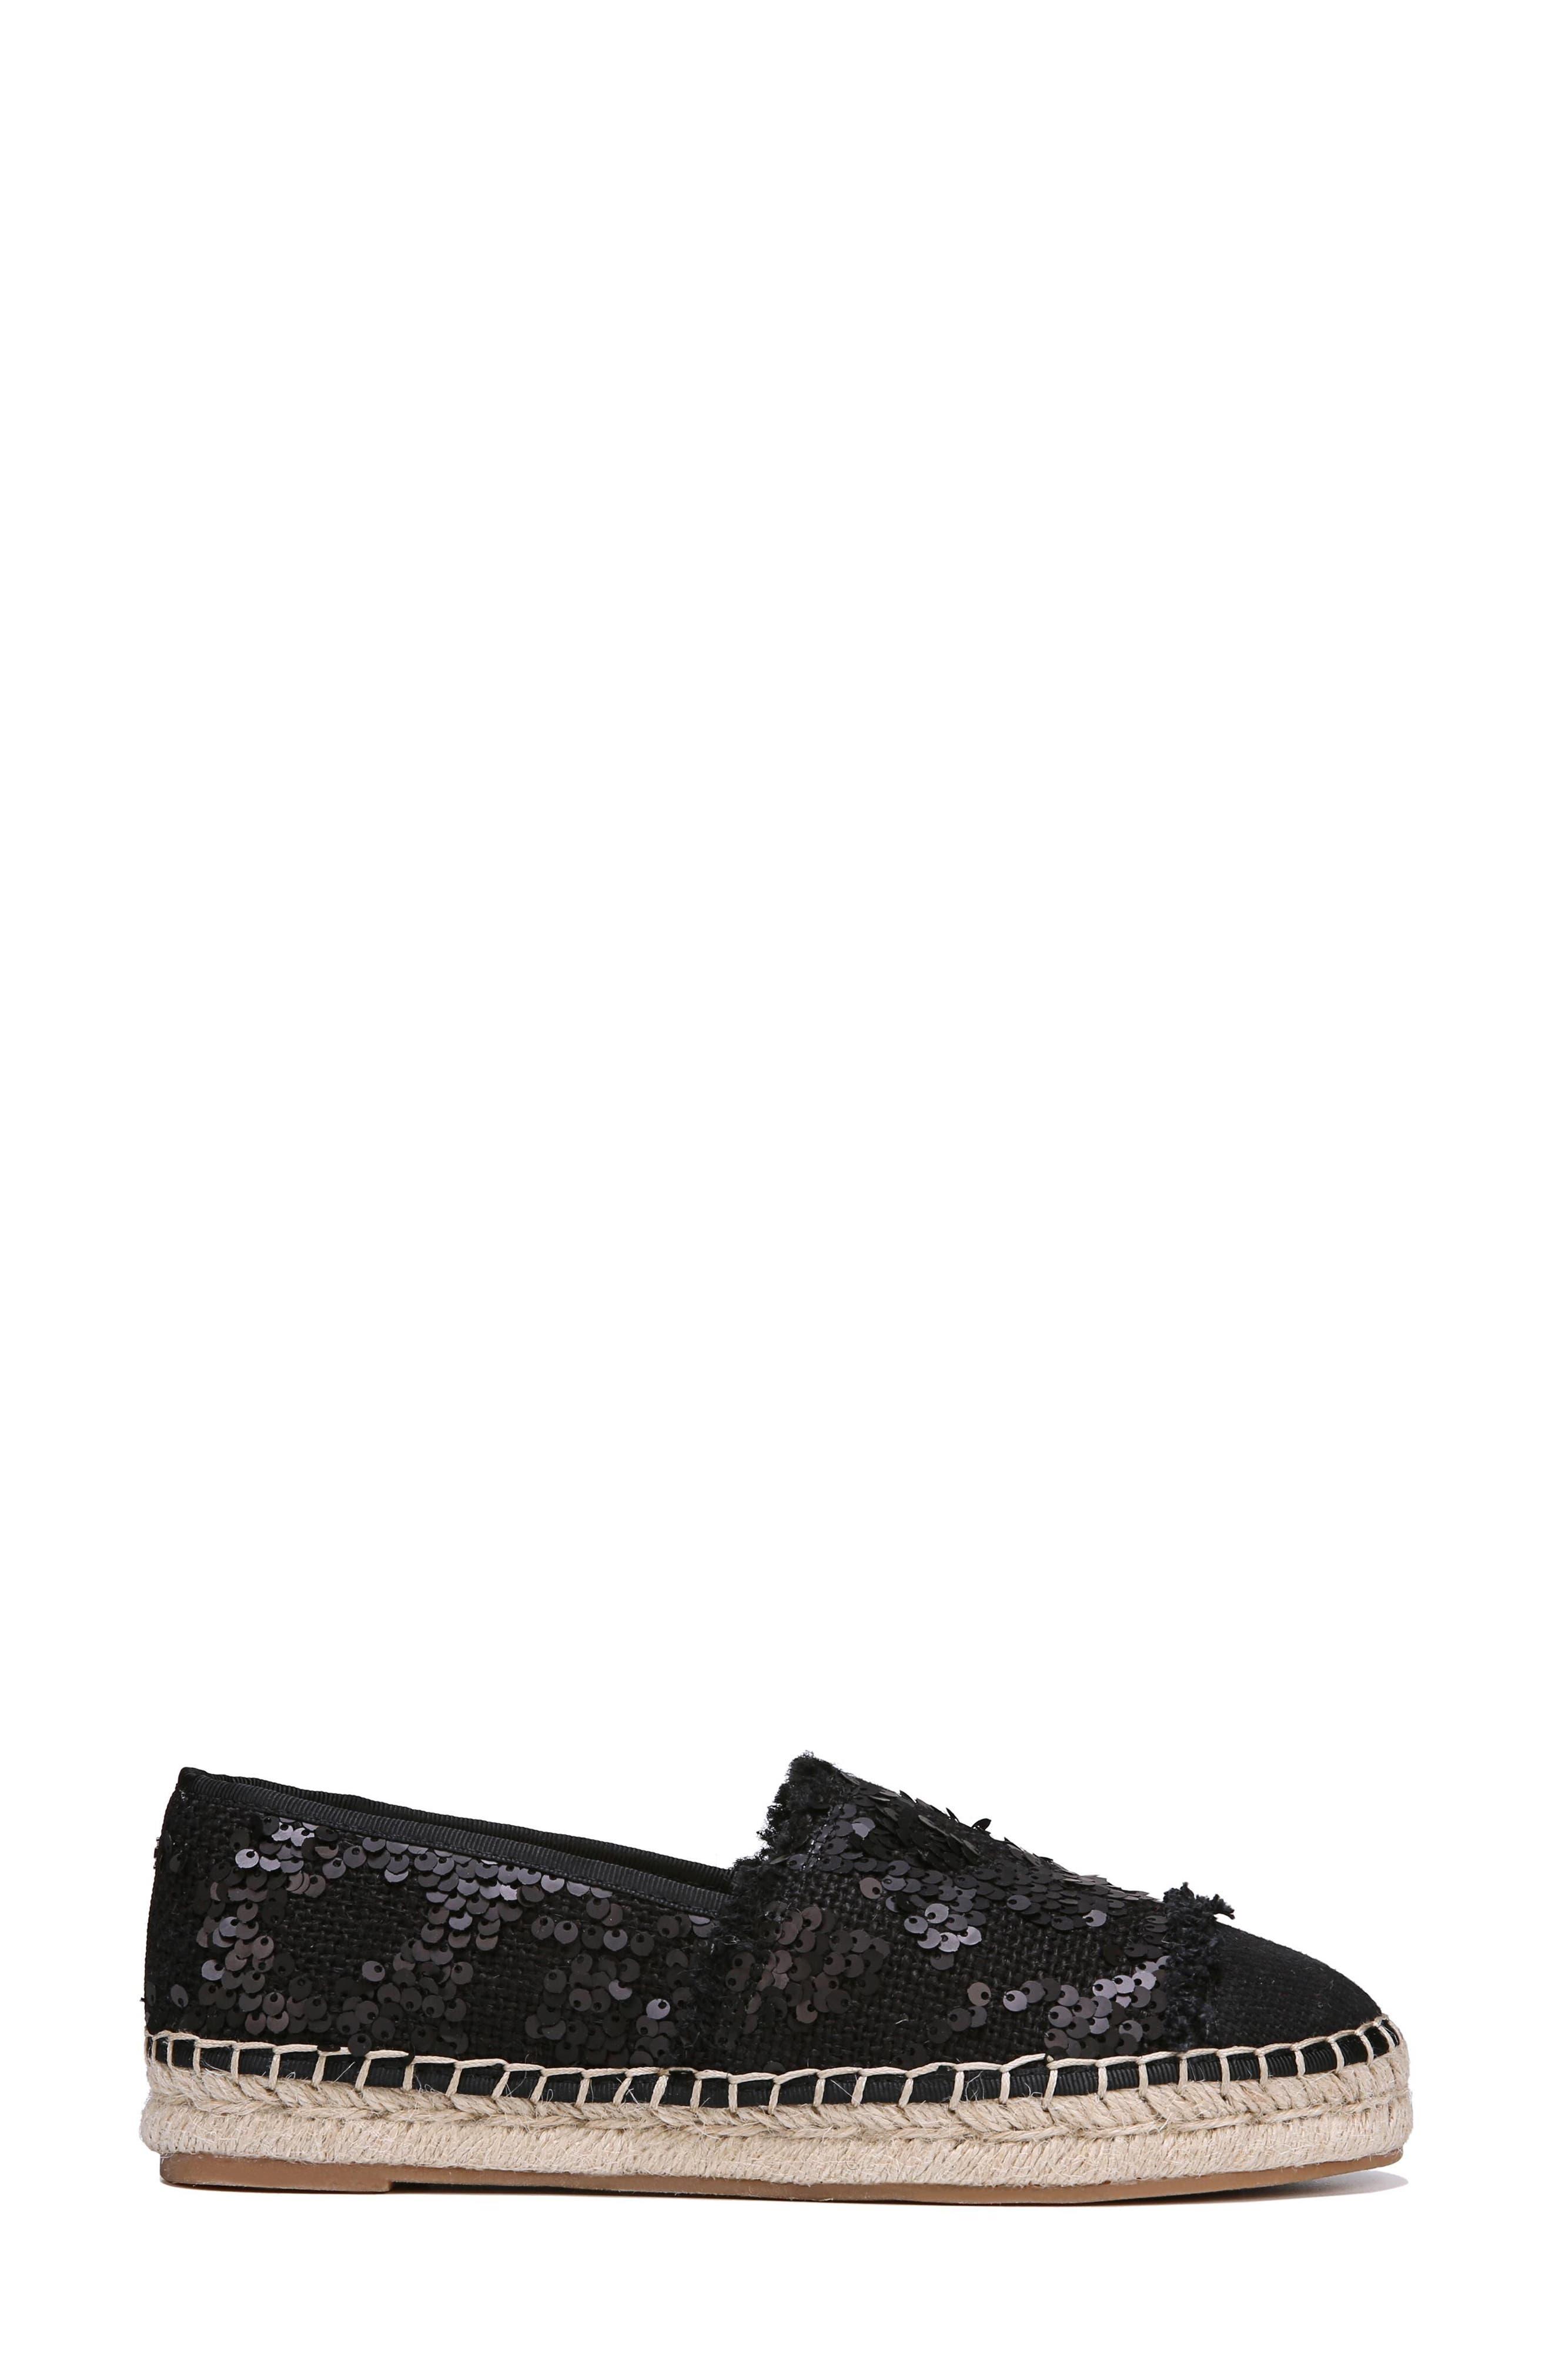 Krissy Espadrille Flat,                             Alternate thumbnail 3, color,                             BLACK SEQUIN FABRIC